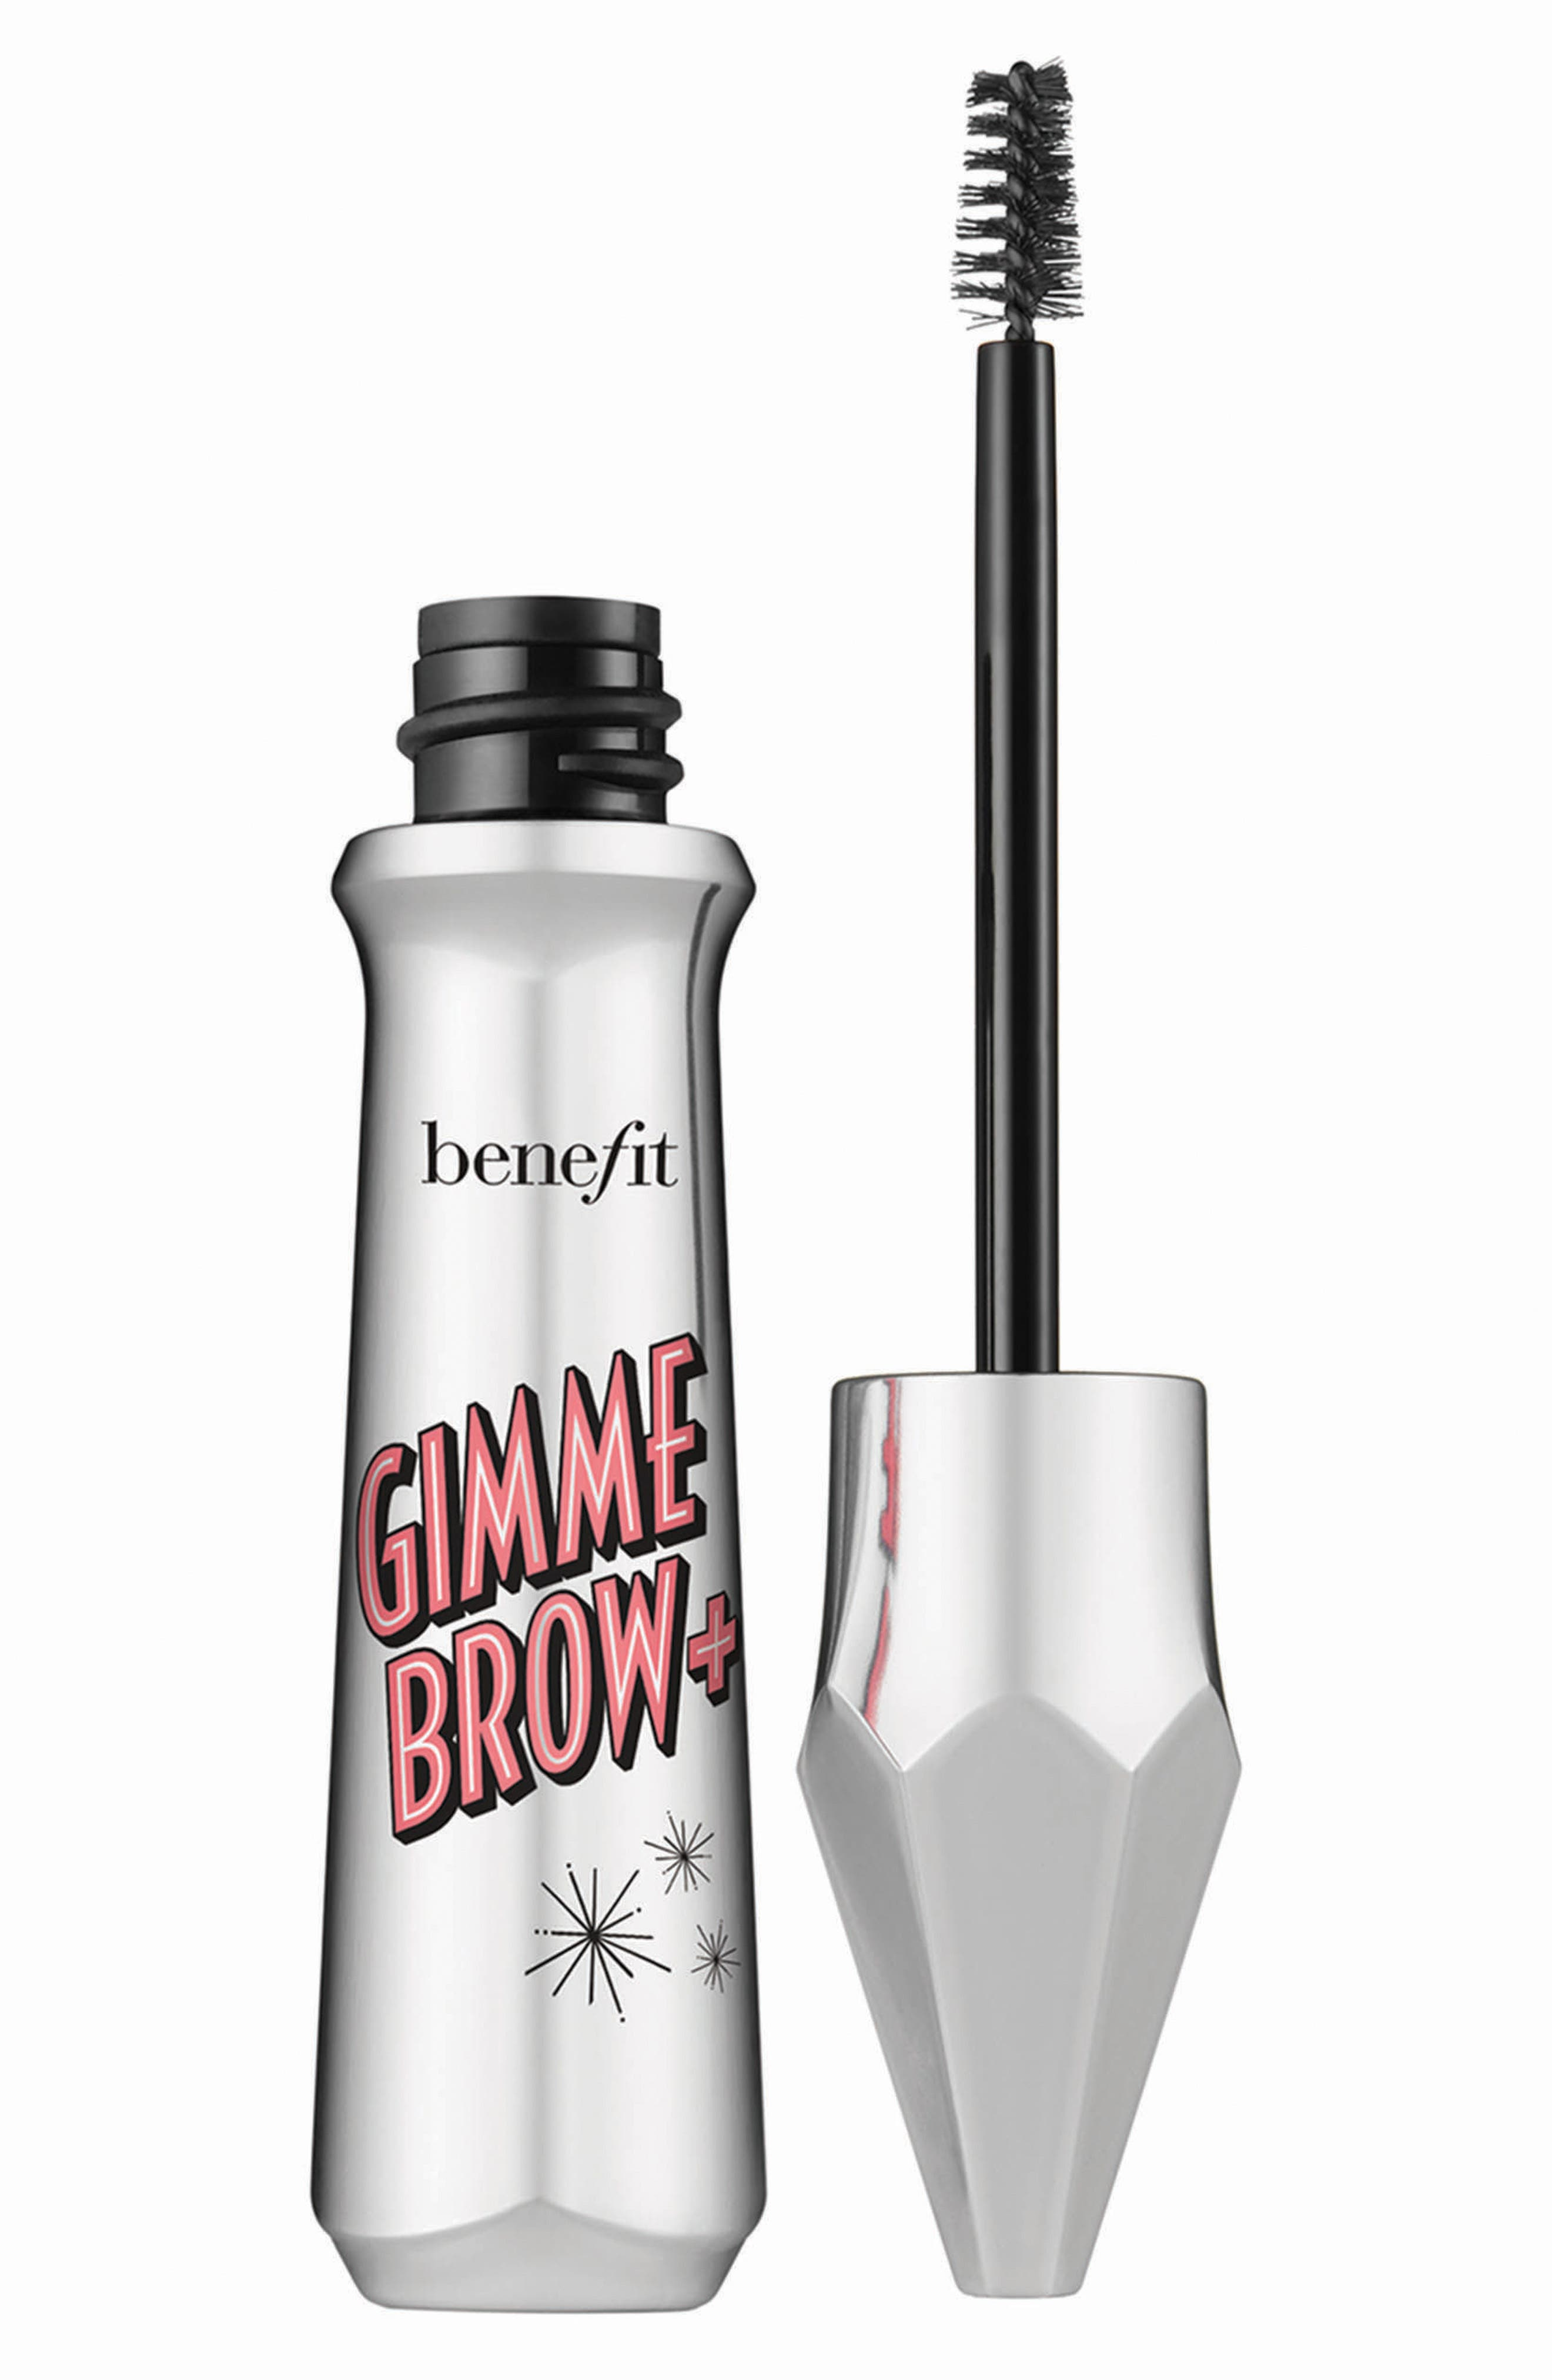 Benefit Gimme Brow+ Volumizing Eyebrow Gel,                             Main thumbnail 1, color,                             01 LIGHT/COOL LIGHT BLONDE